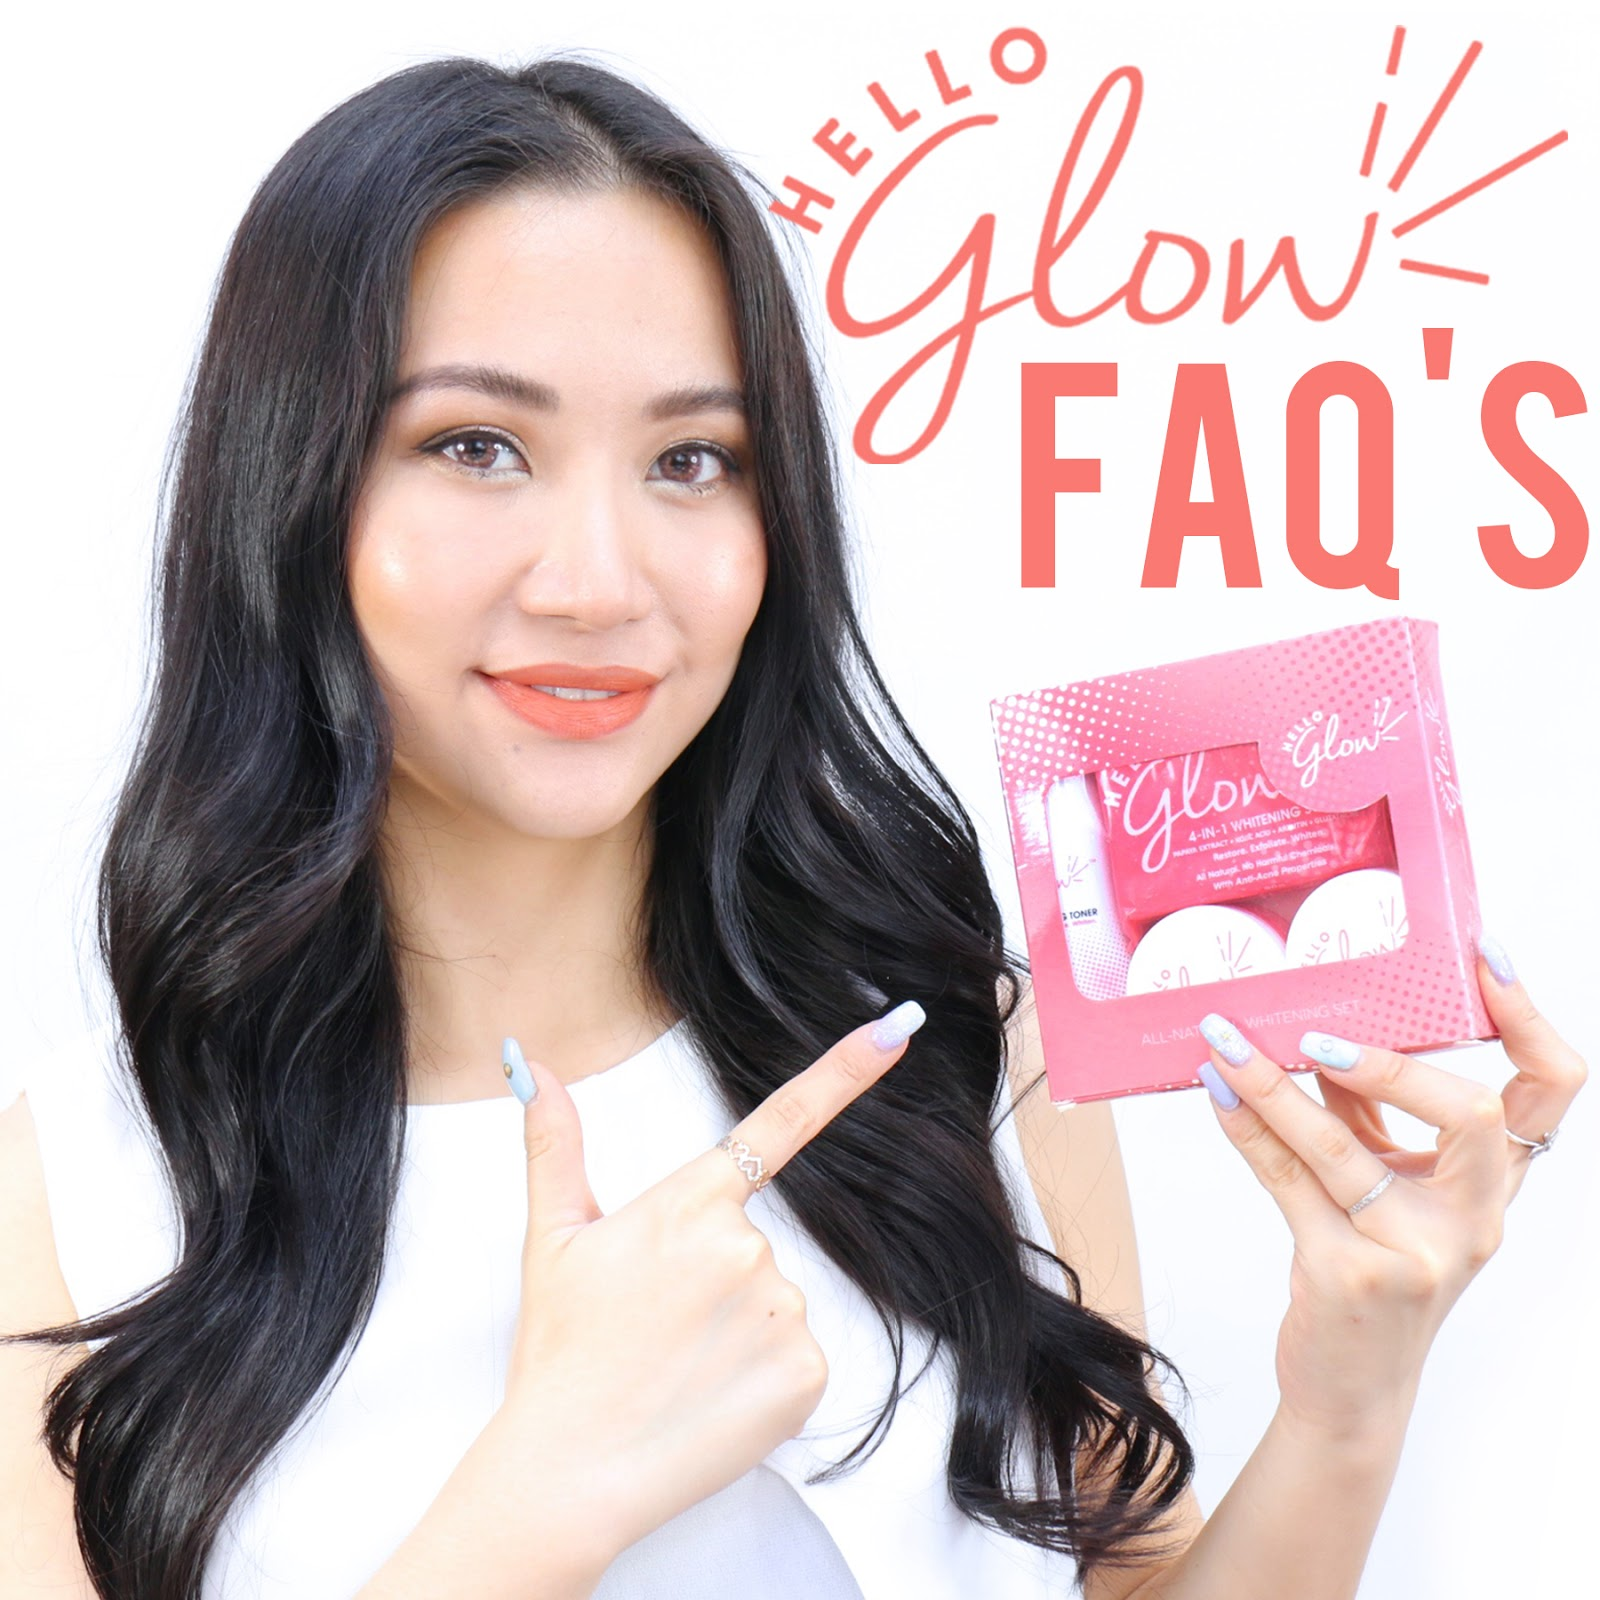 Hello Glow Mega FAQ's cover photo